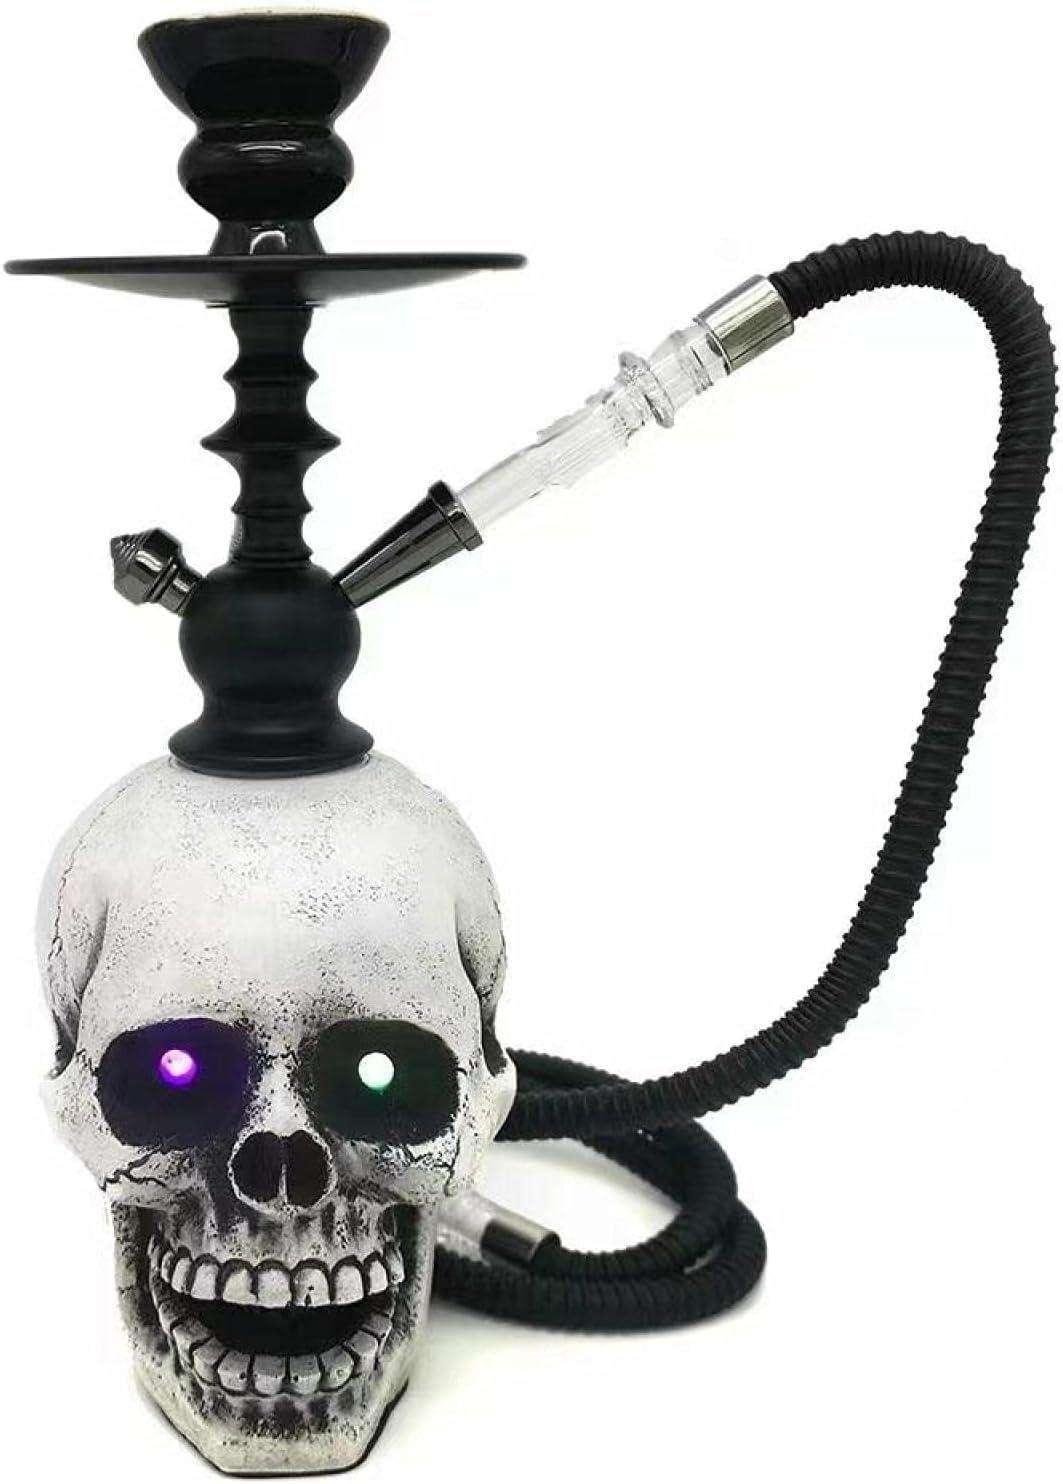 XXIXXV Cachimba árabe shisha cráneo llevó la luz de la barra de recarga Ktv cachimba grande Chicha conjunto cachimbas para fumar consejos tubo tabaco tubo vapes fiesta